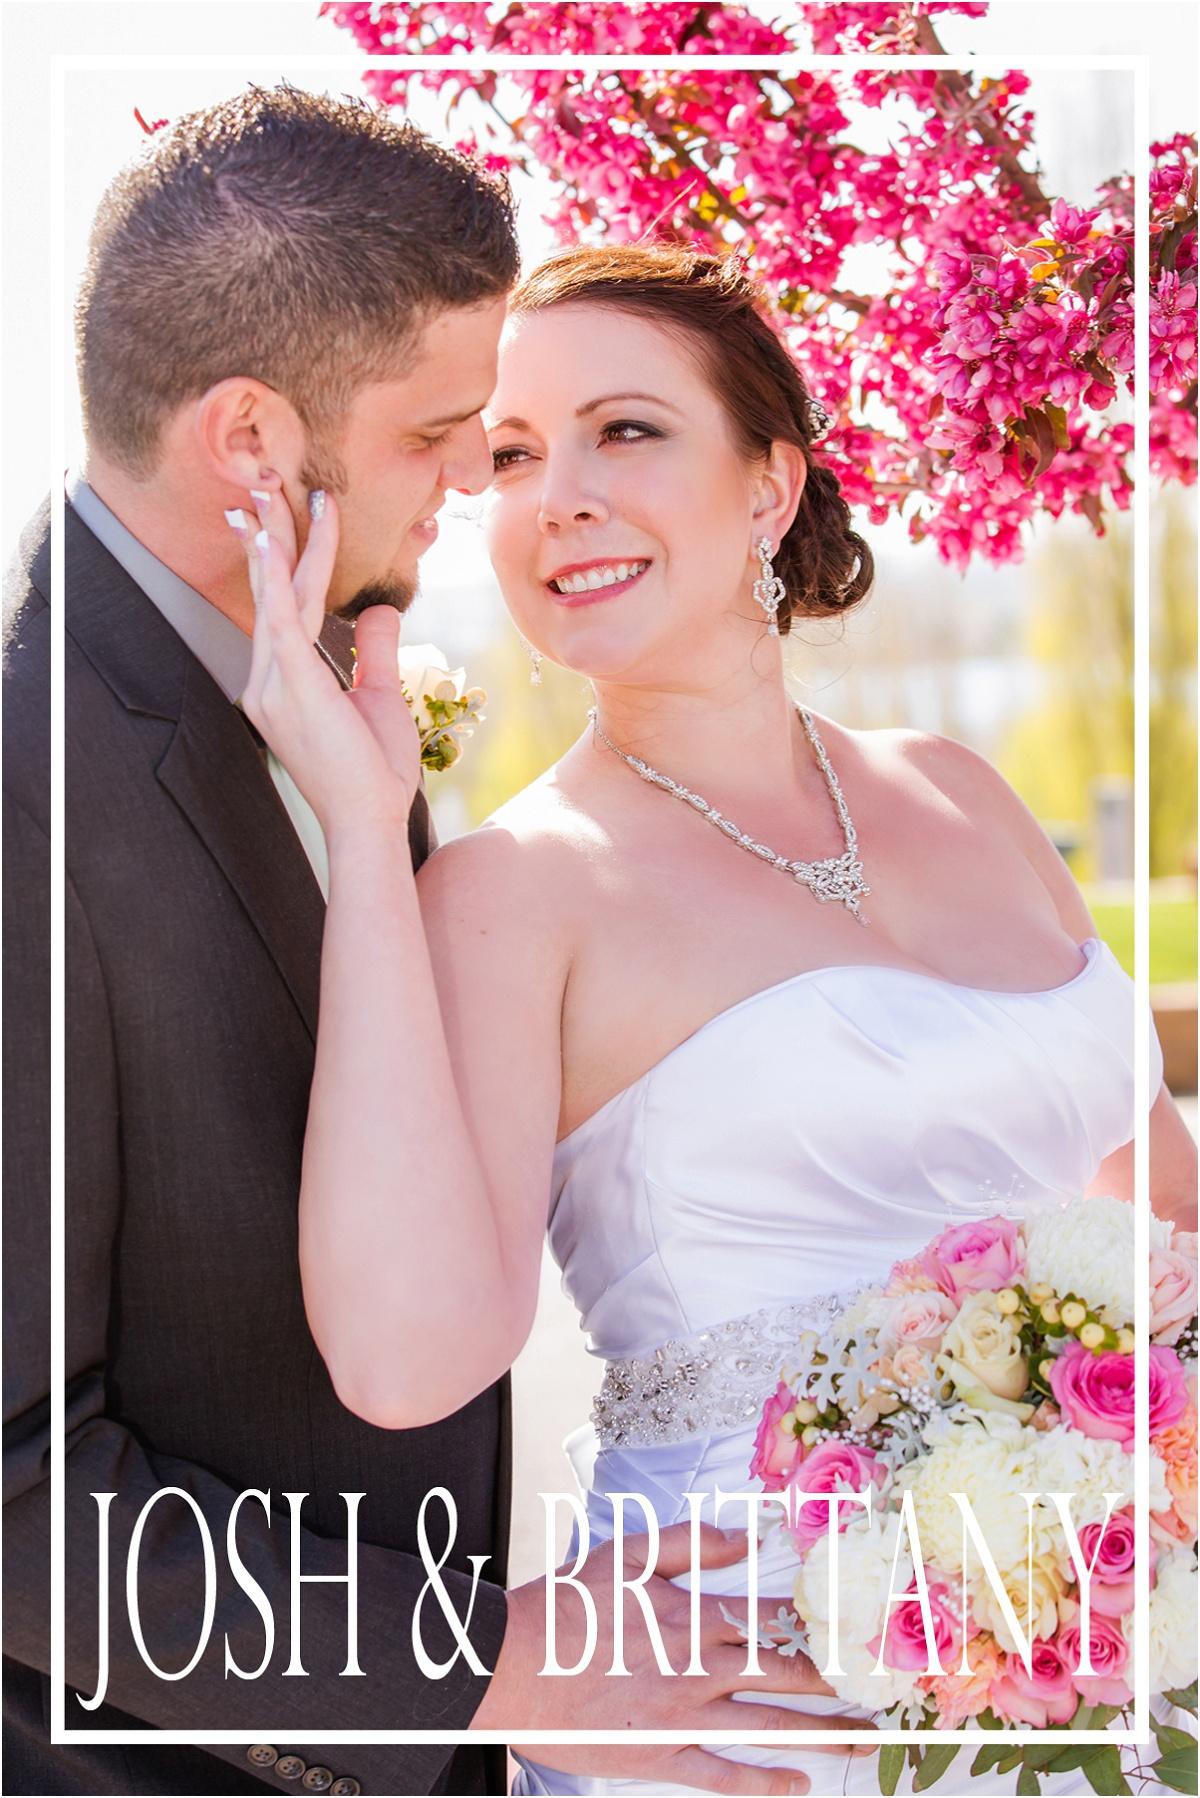 Terra Cooper Photography Weddings Brides 2015_5390.jpg